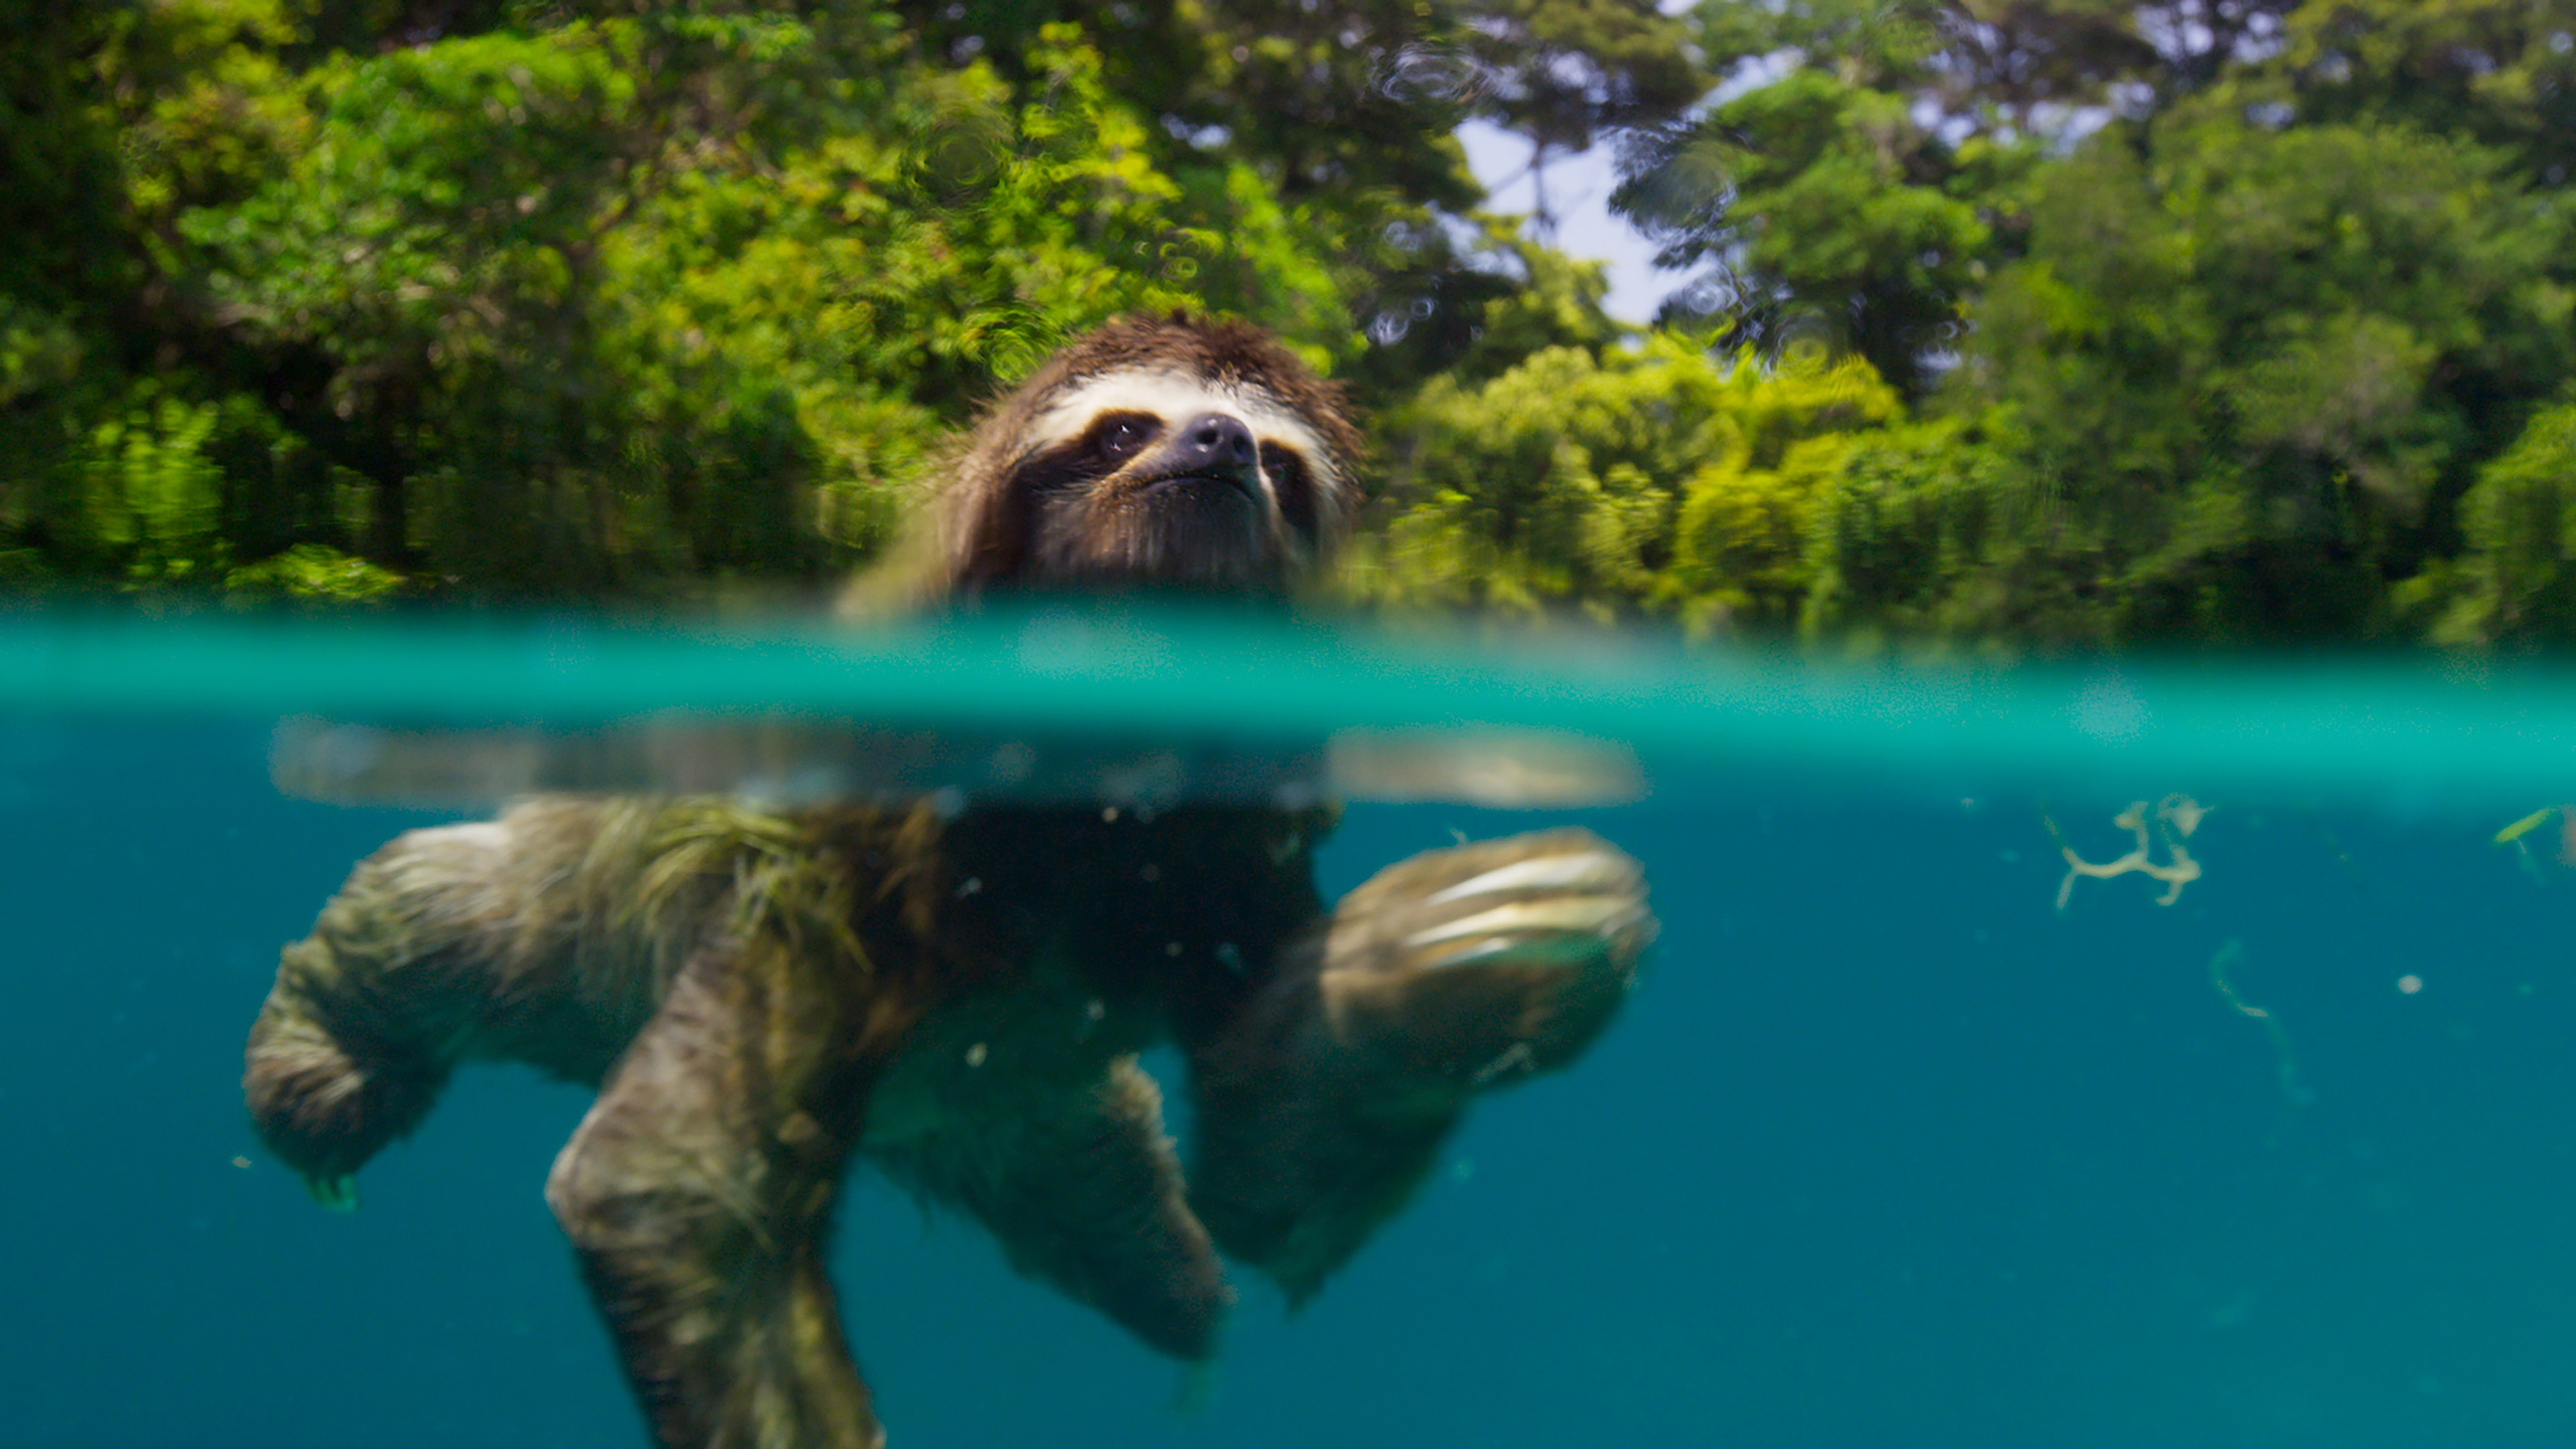 planet earth animals - photo #6